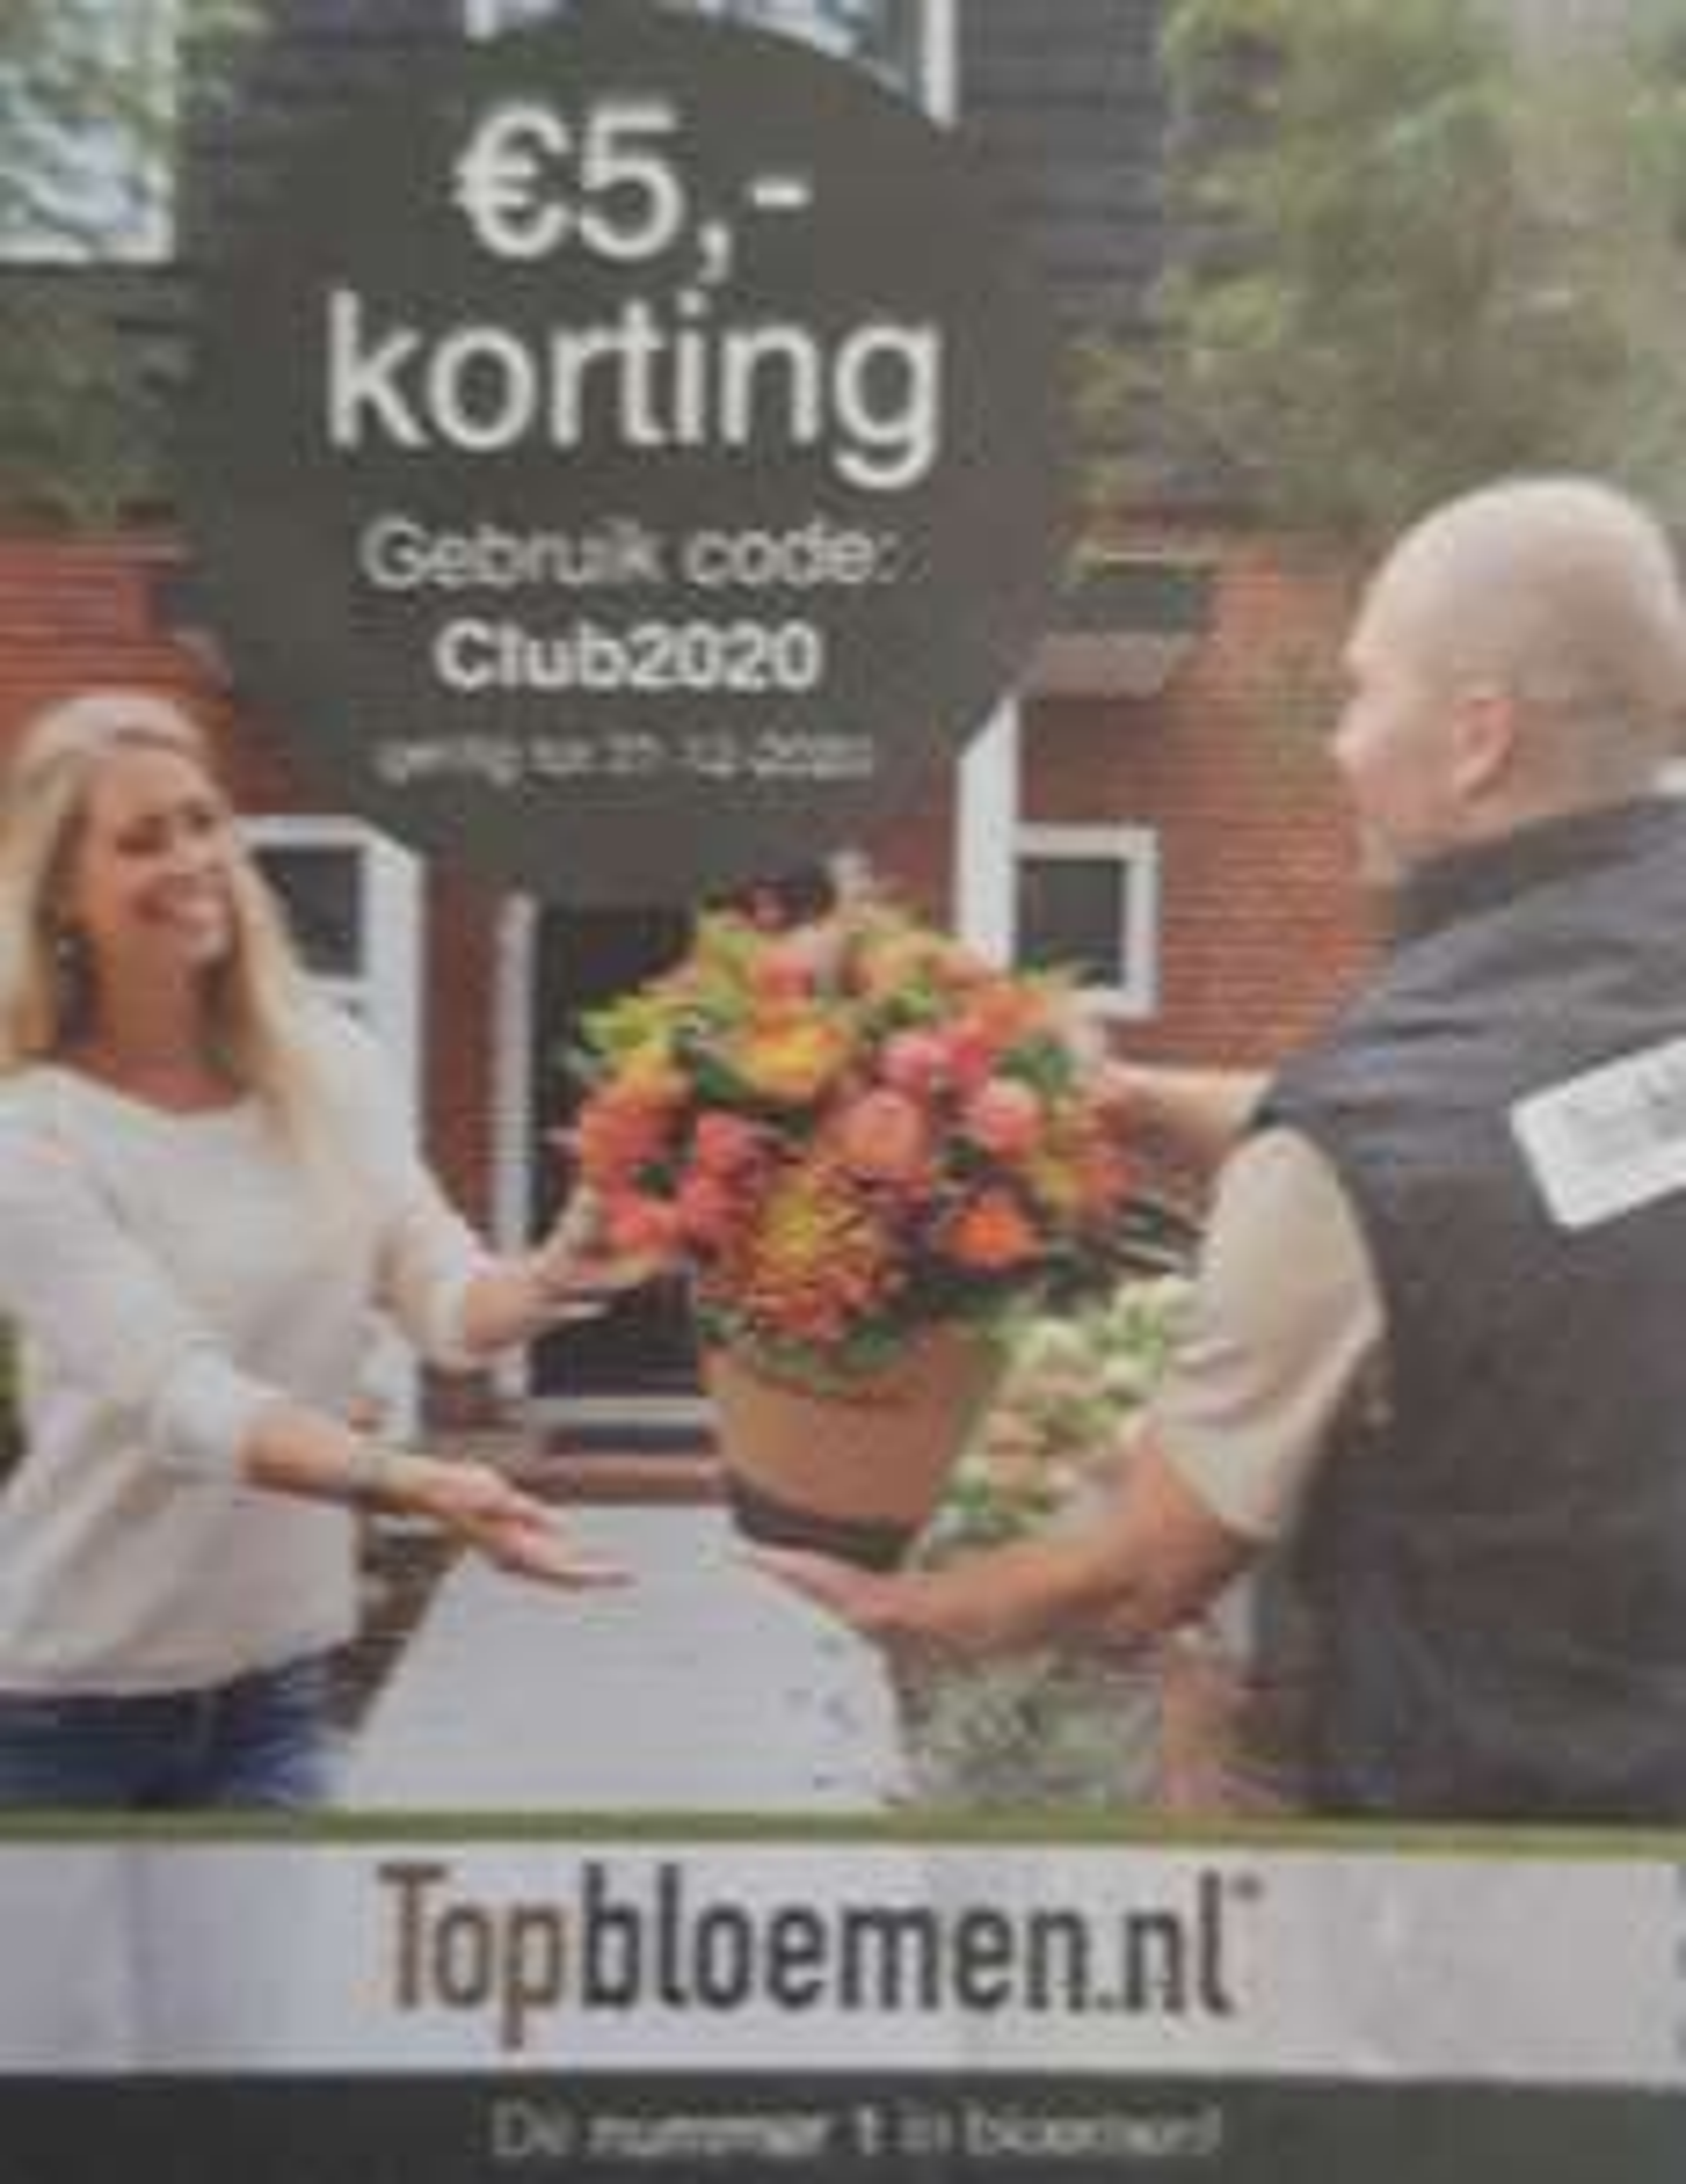 [Topbloemen.nl] €5,- korting